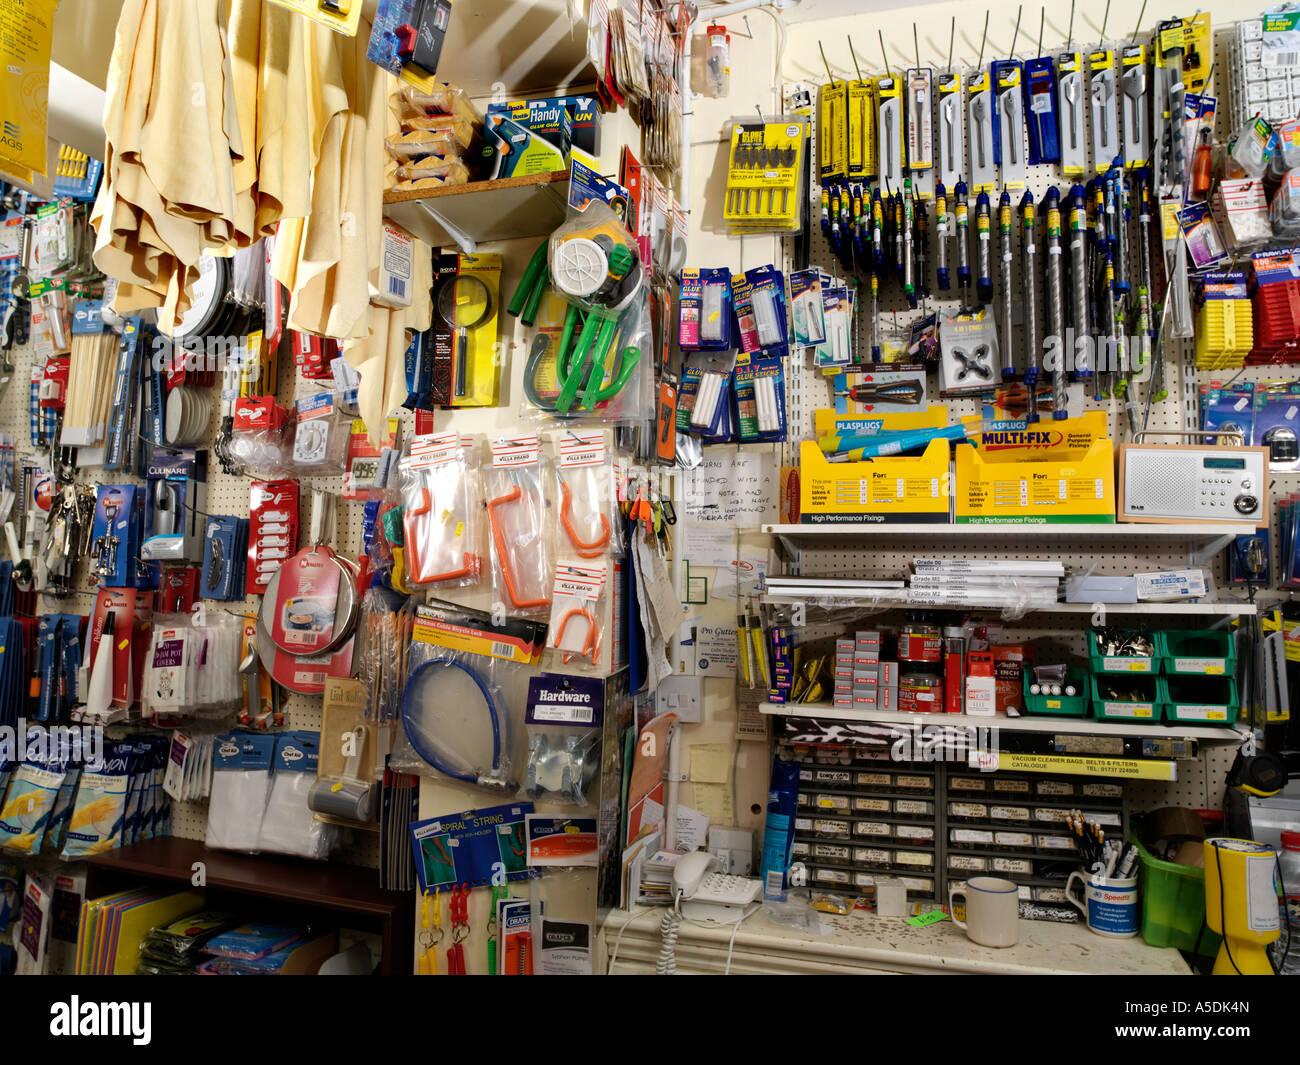 Hardware Shop Stock Photos & Hardware Shop Stock Images - Alamy